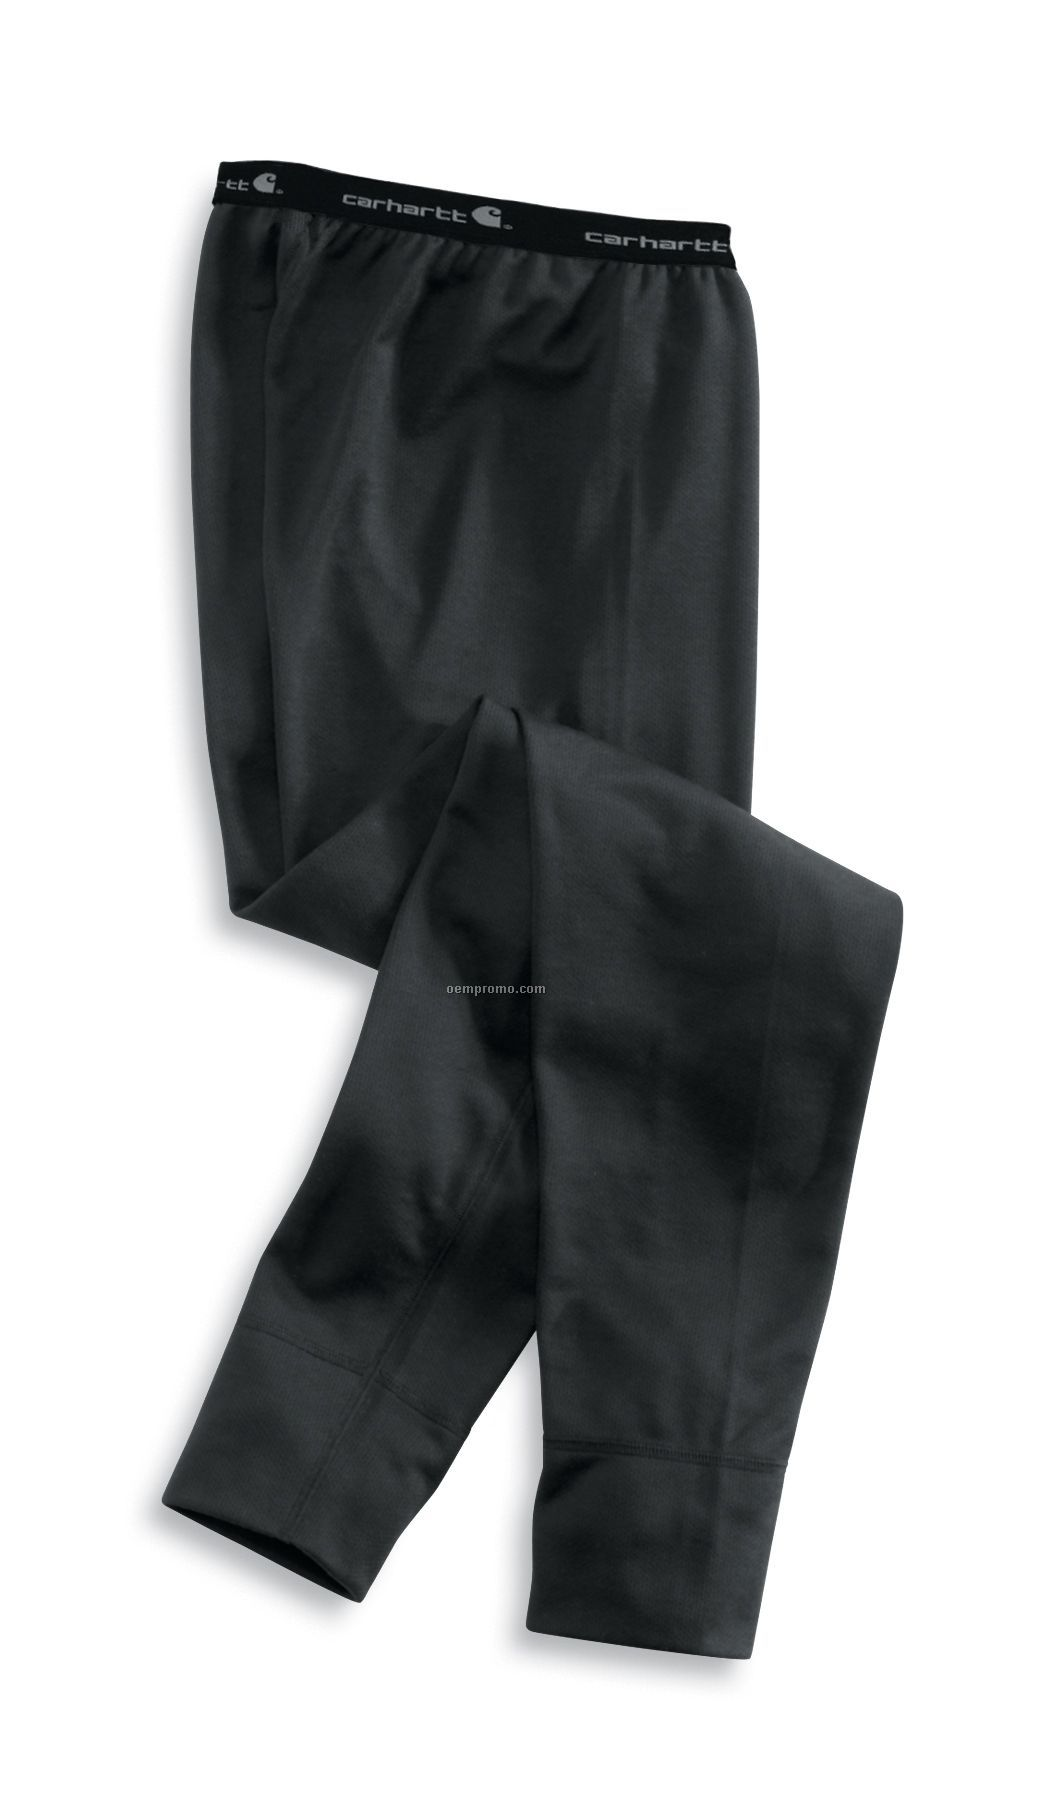 Carhartt Women's Midweight Work-dry Thermal Bottom (Xs-2xl)